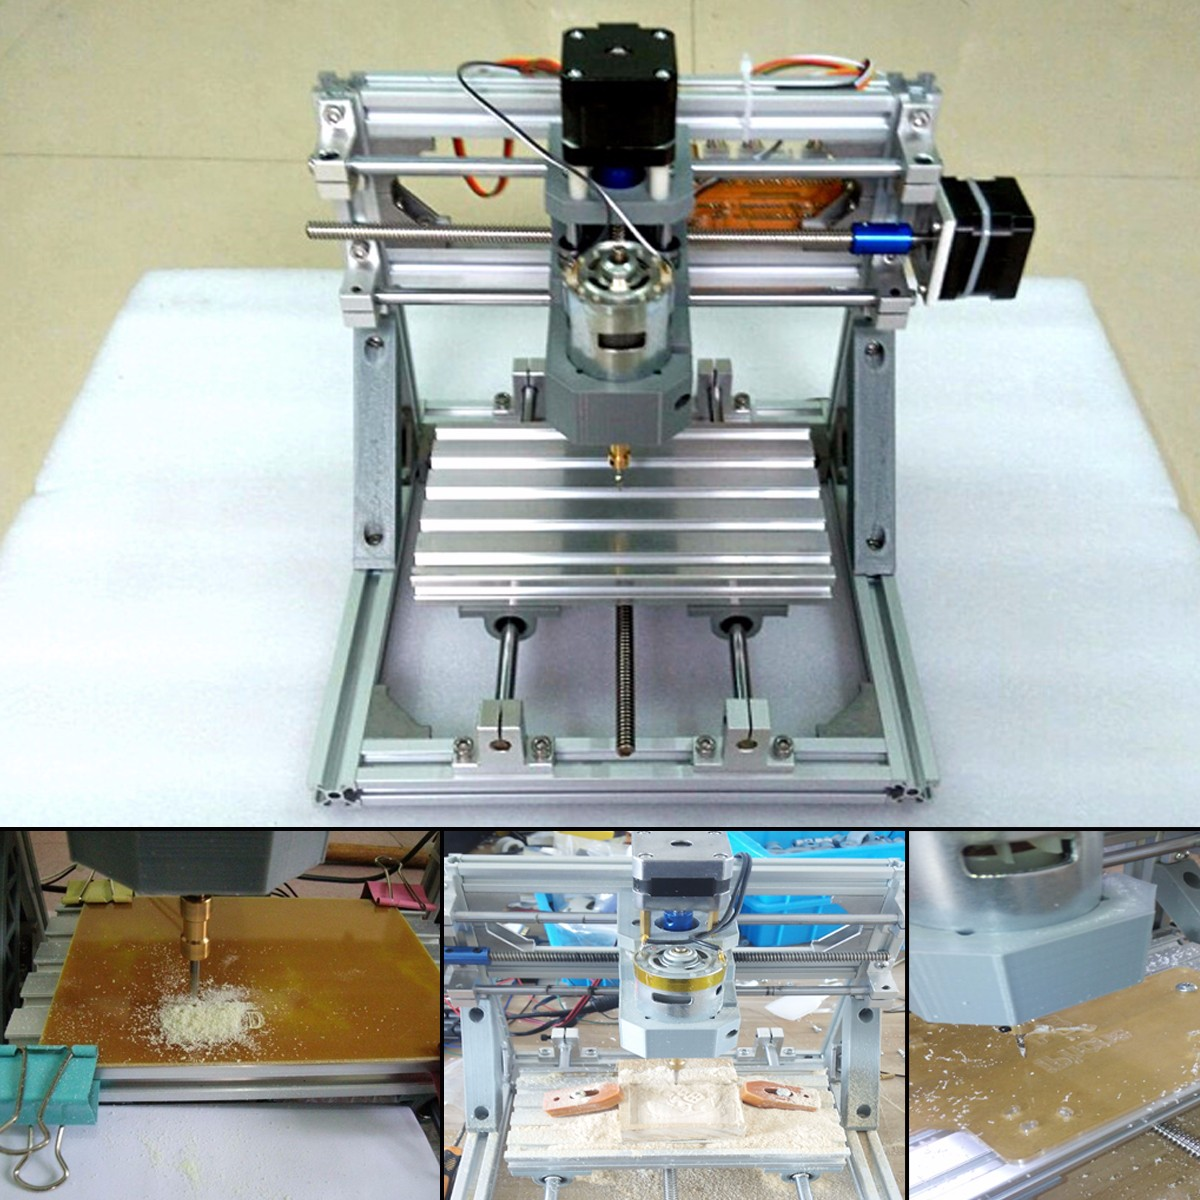 Mini 3 Lasergravure Graveur Machine DC 12V DIY Desktop Hout Cutter/Printer/Power Verstelbare Met 500MW Laser Hoofd - 2